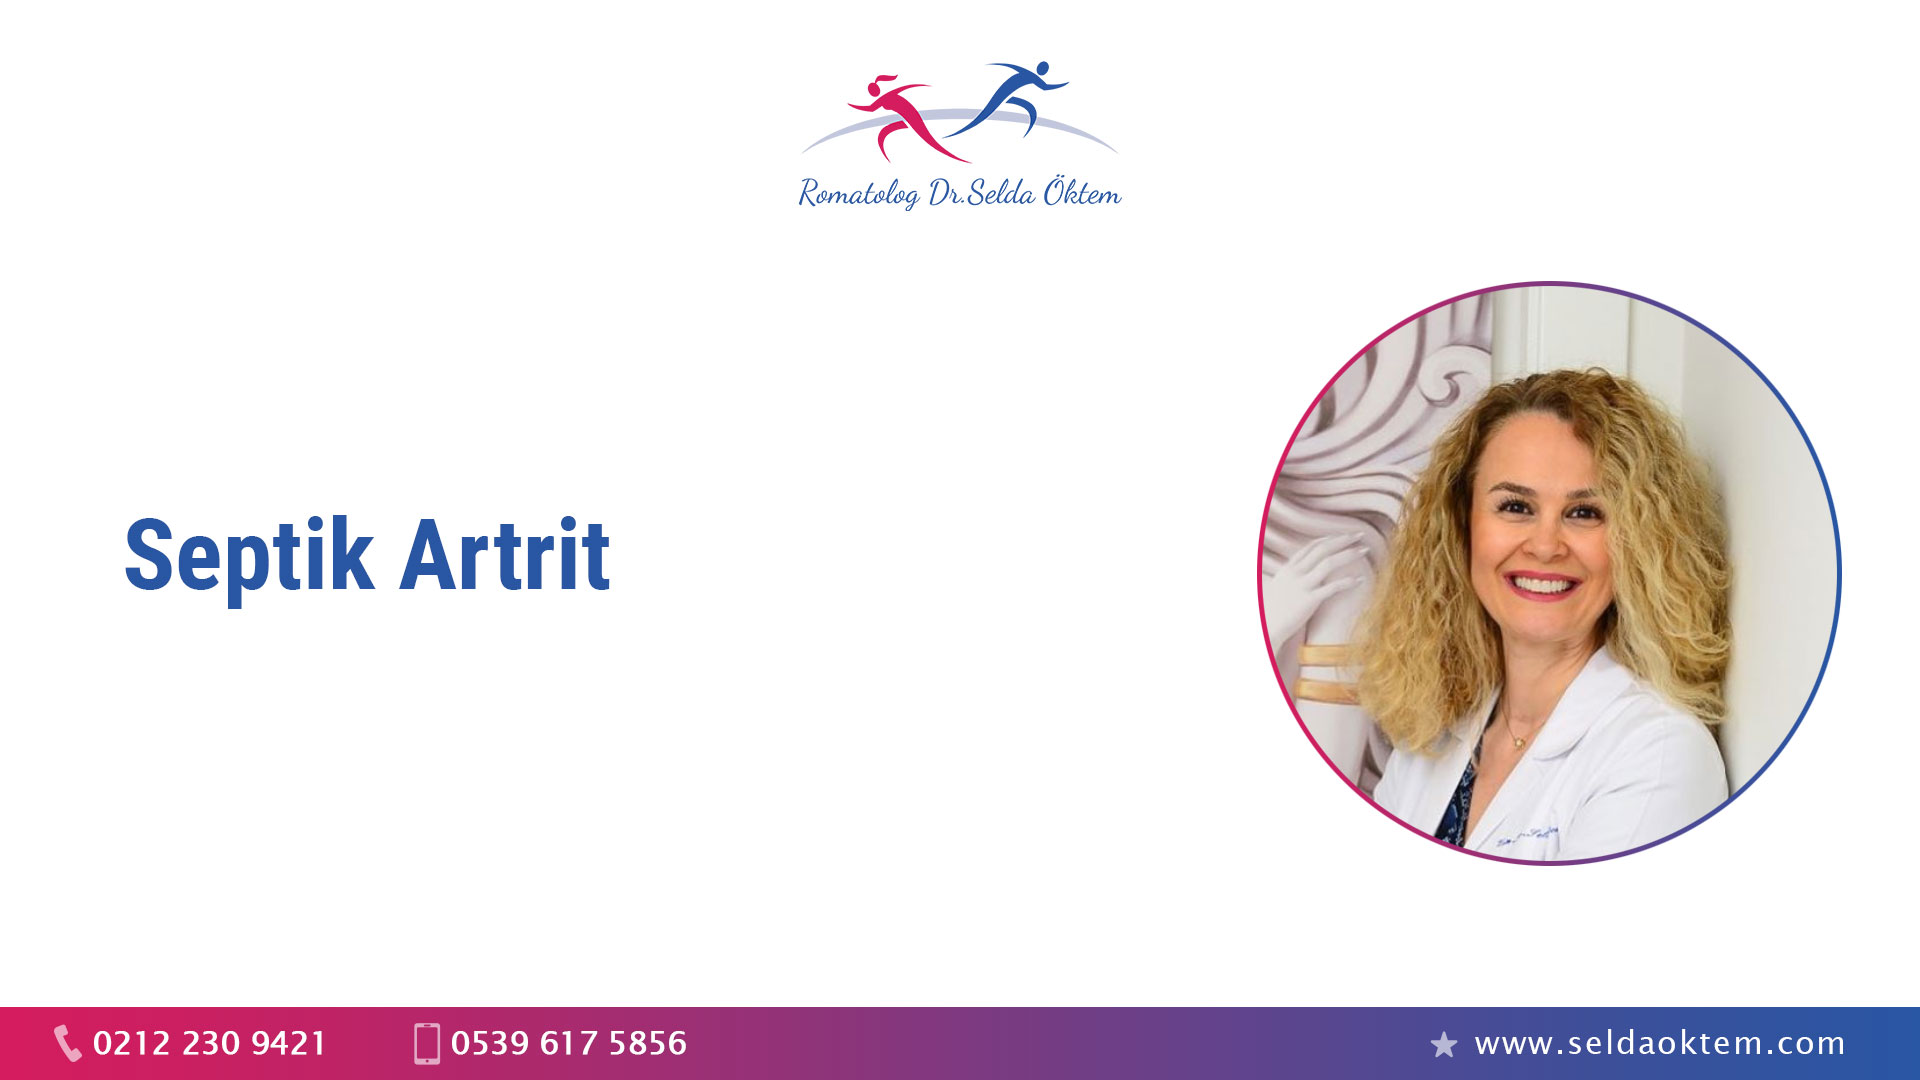 Septik Artrit